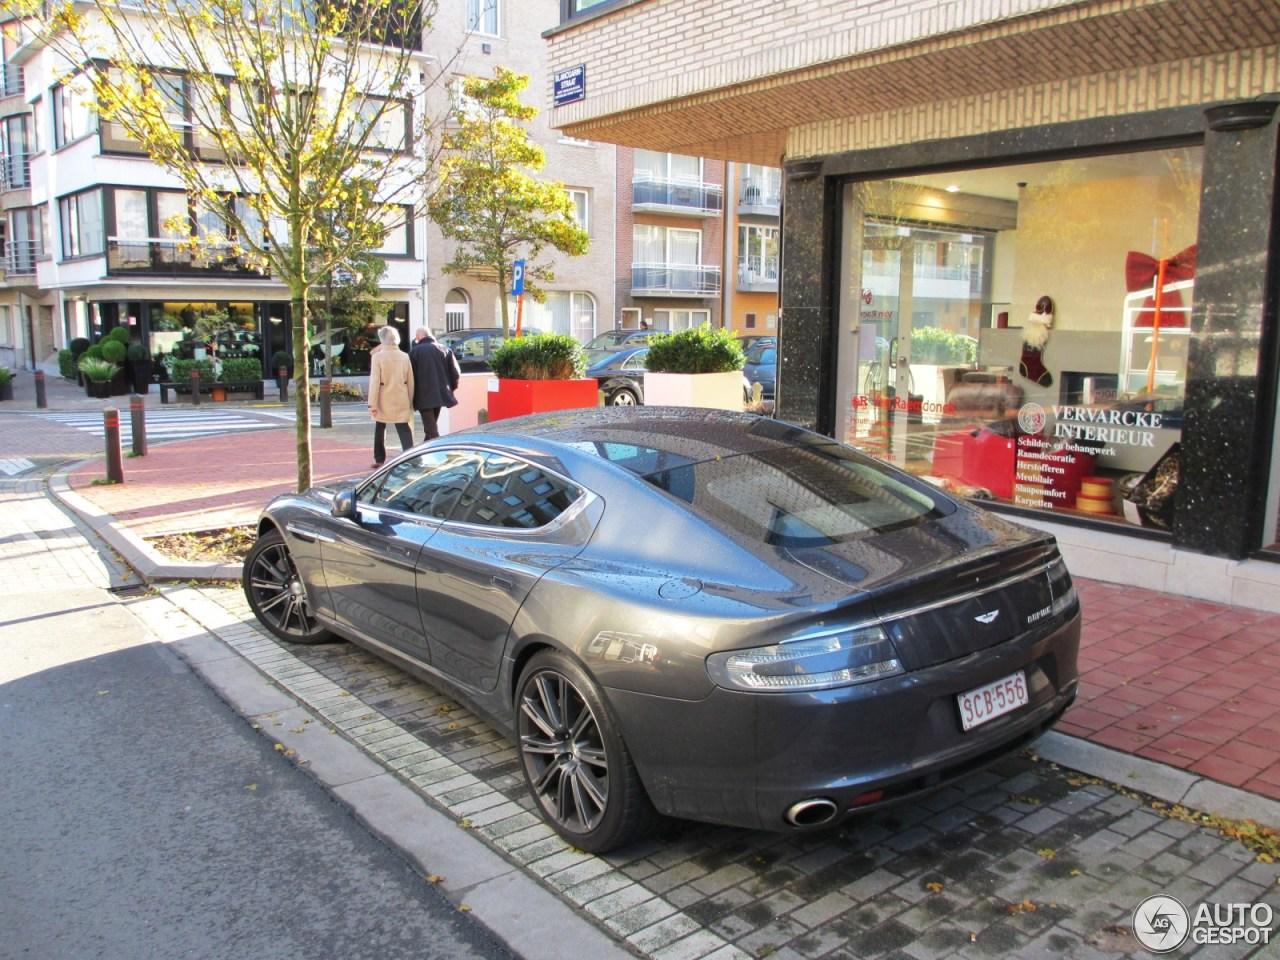 Aston Martin Rapide 19 November 2012 Autogespot